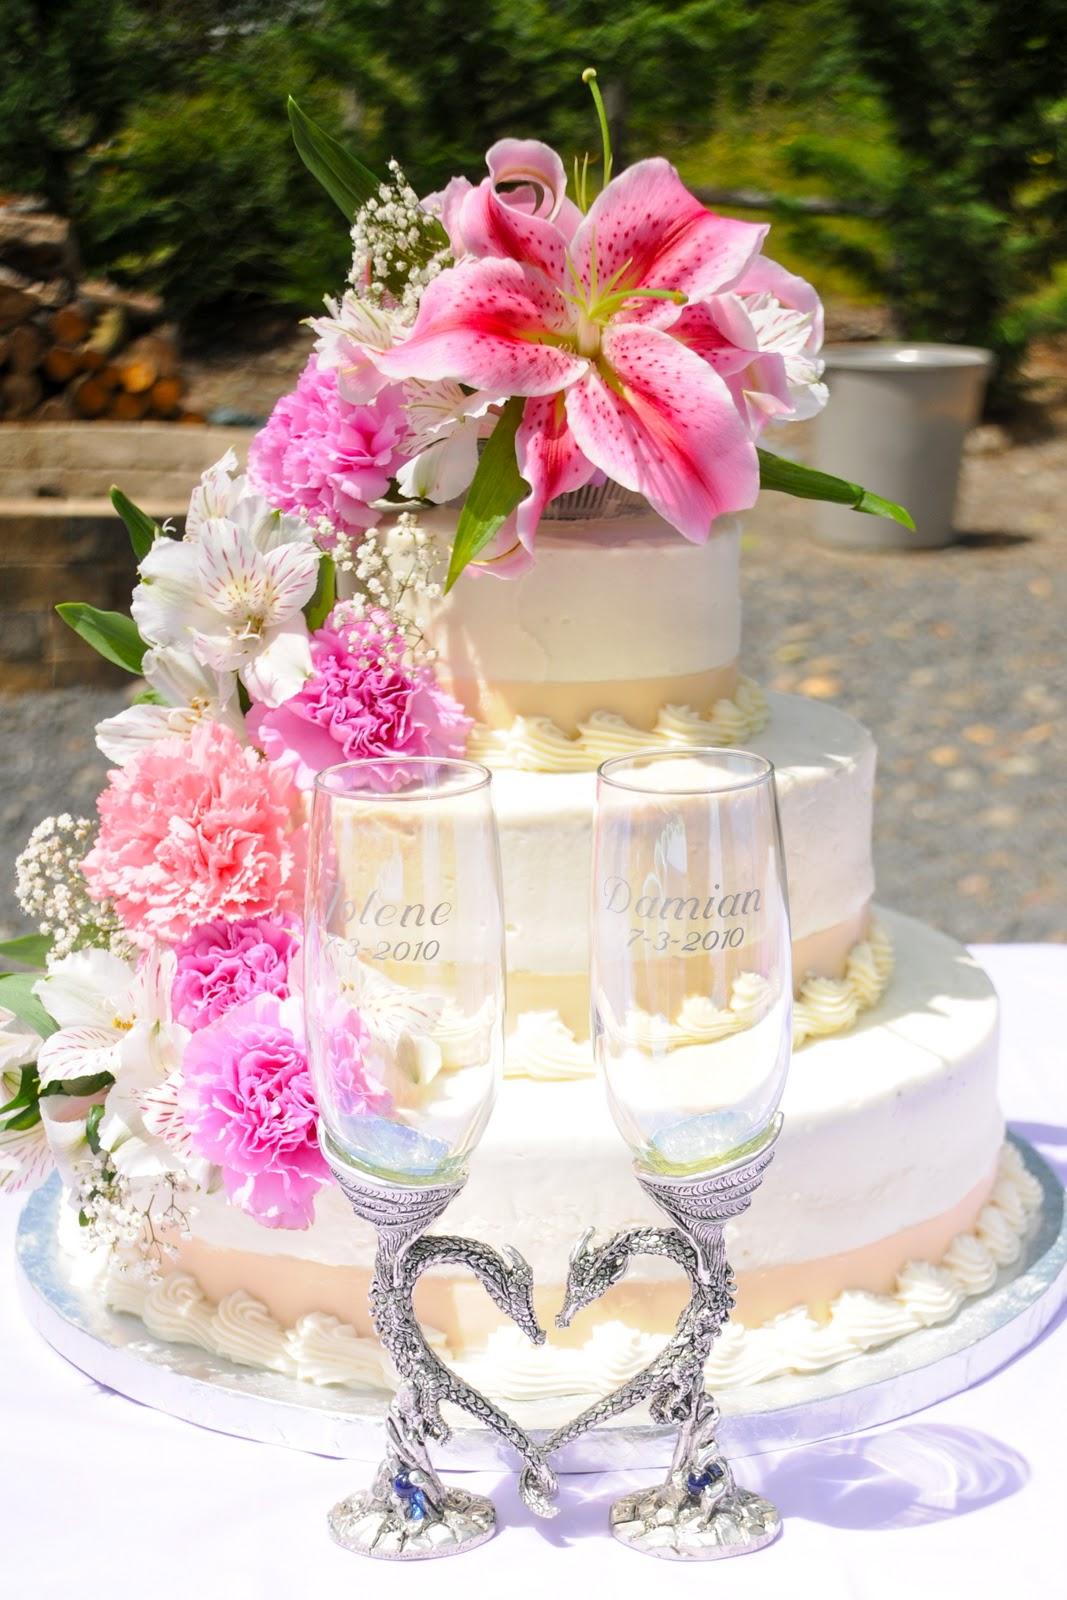 Sarah\'s Icing on the Cake: Wedding Cake-Fresh Flowers